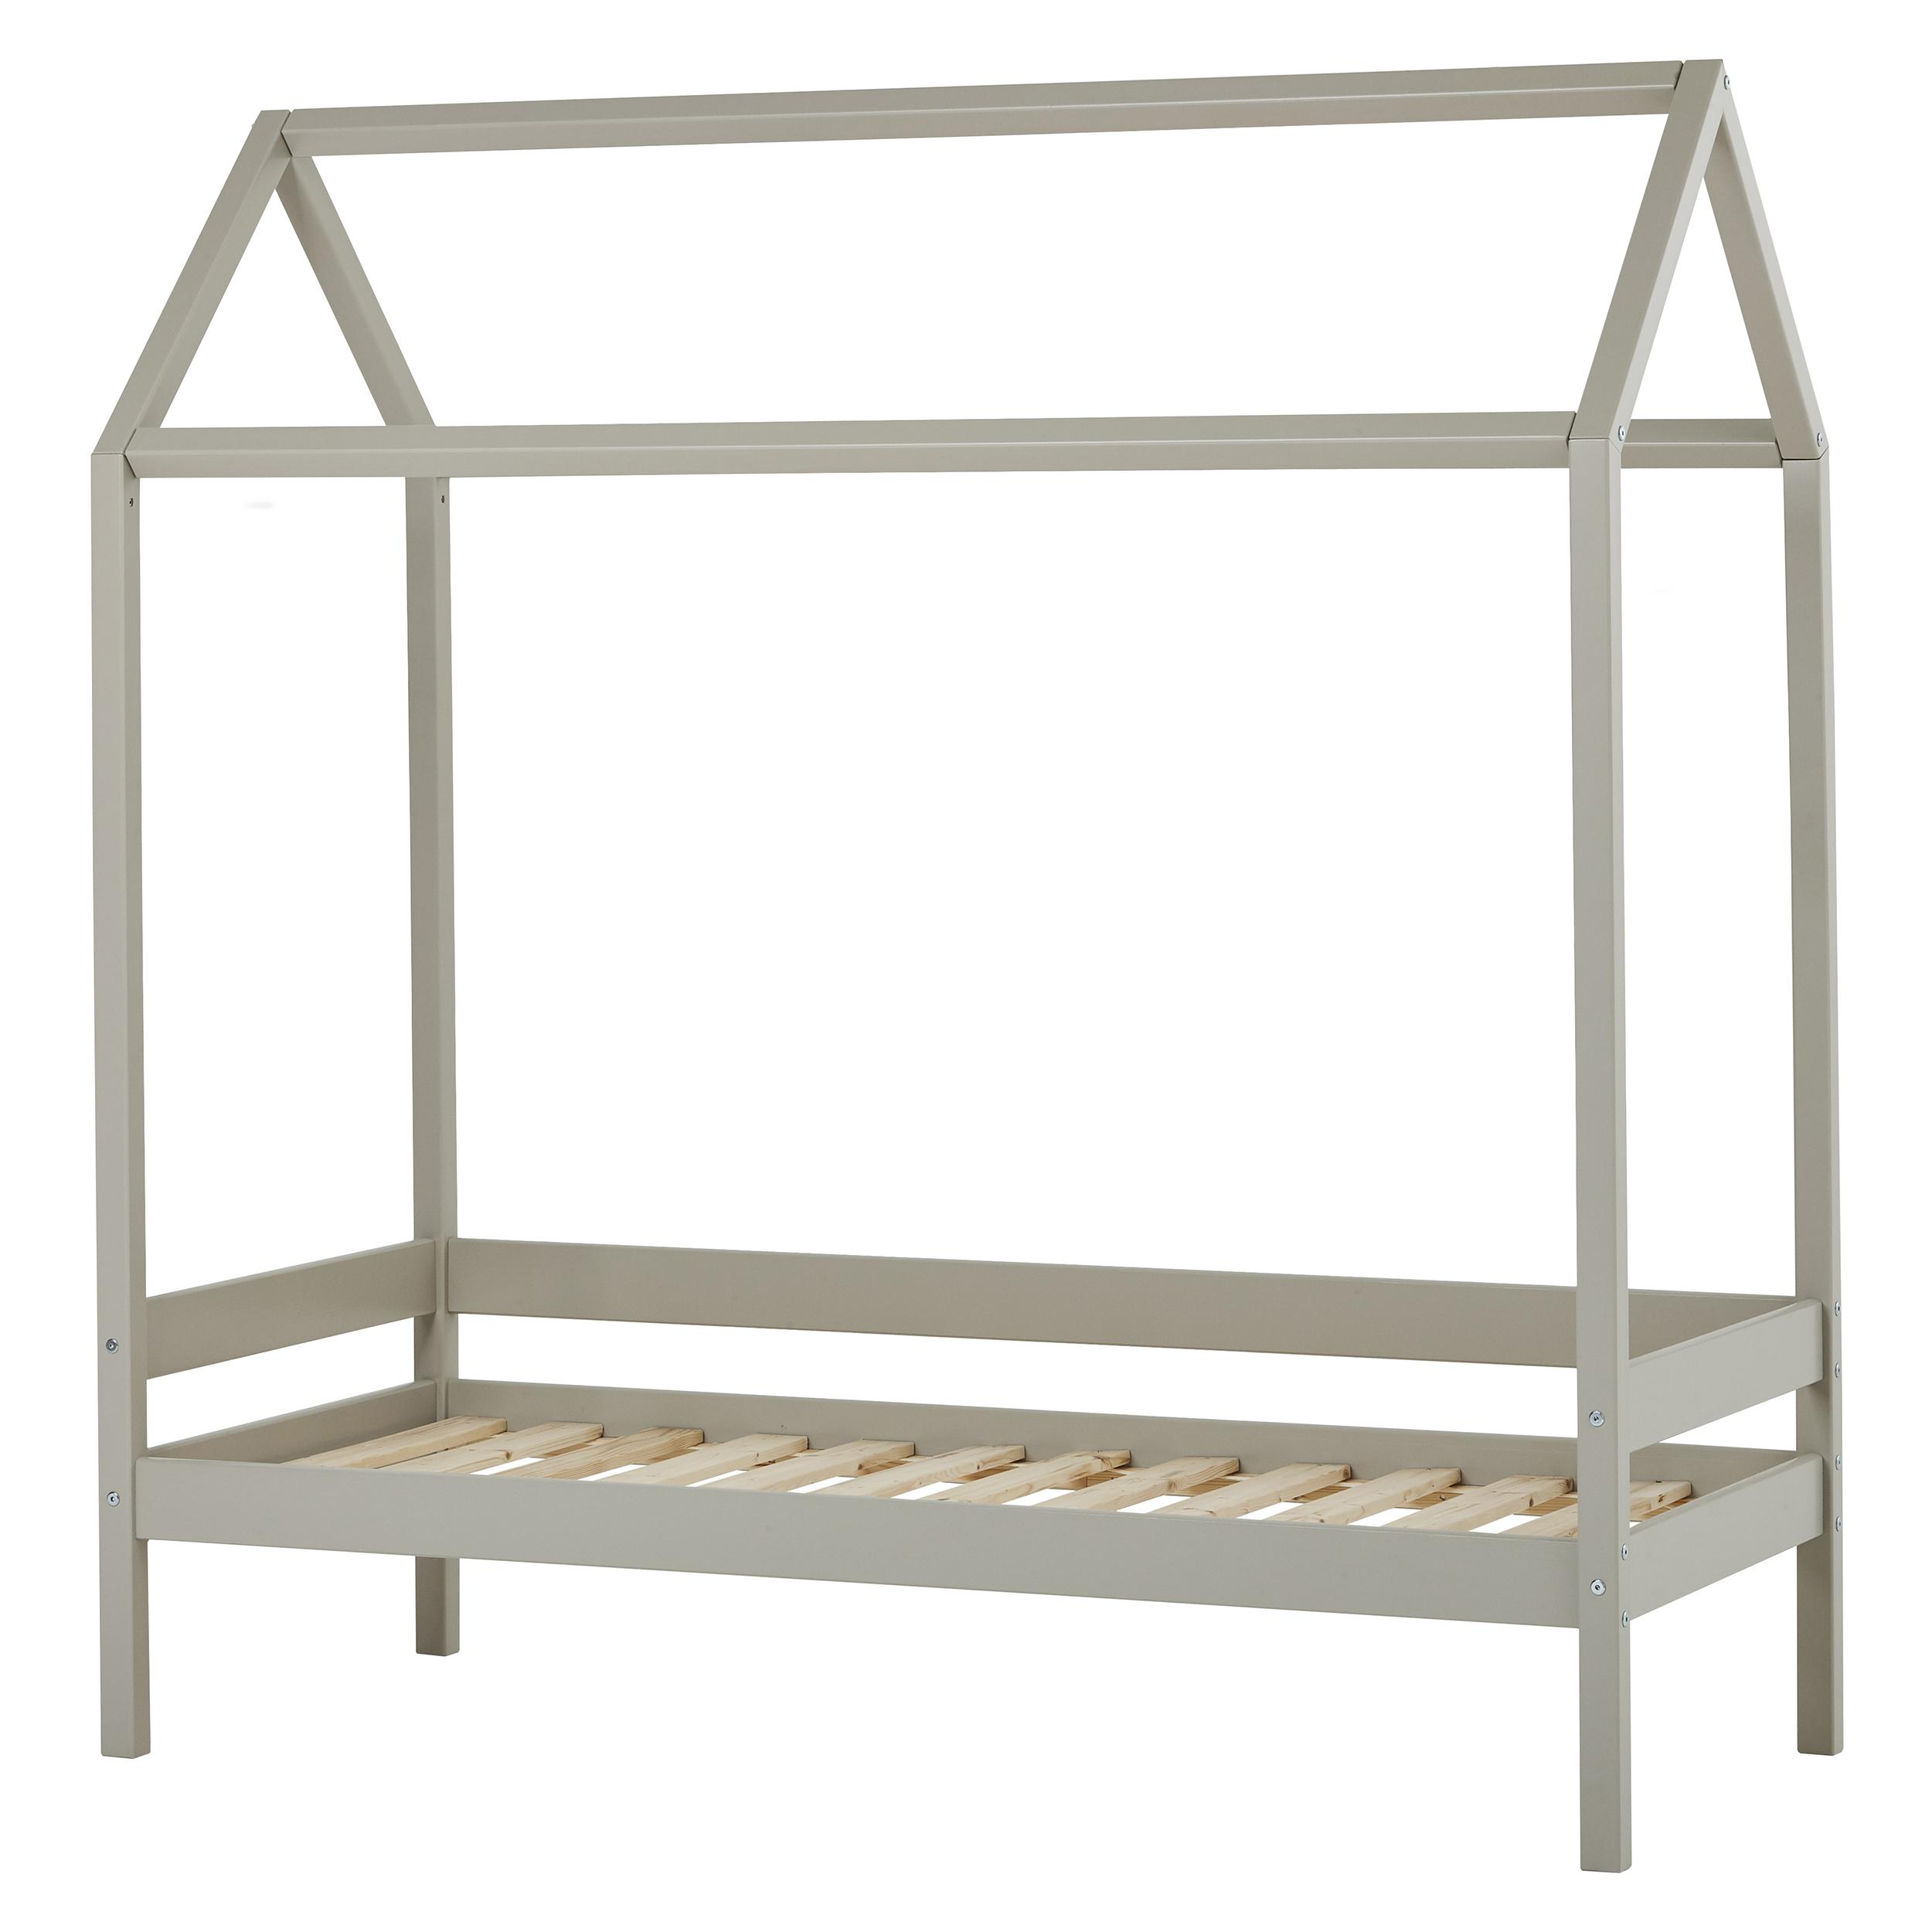 Hoppekids - IDA-MARIE House Bed 70x160cm - Dove Grey